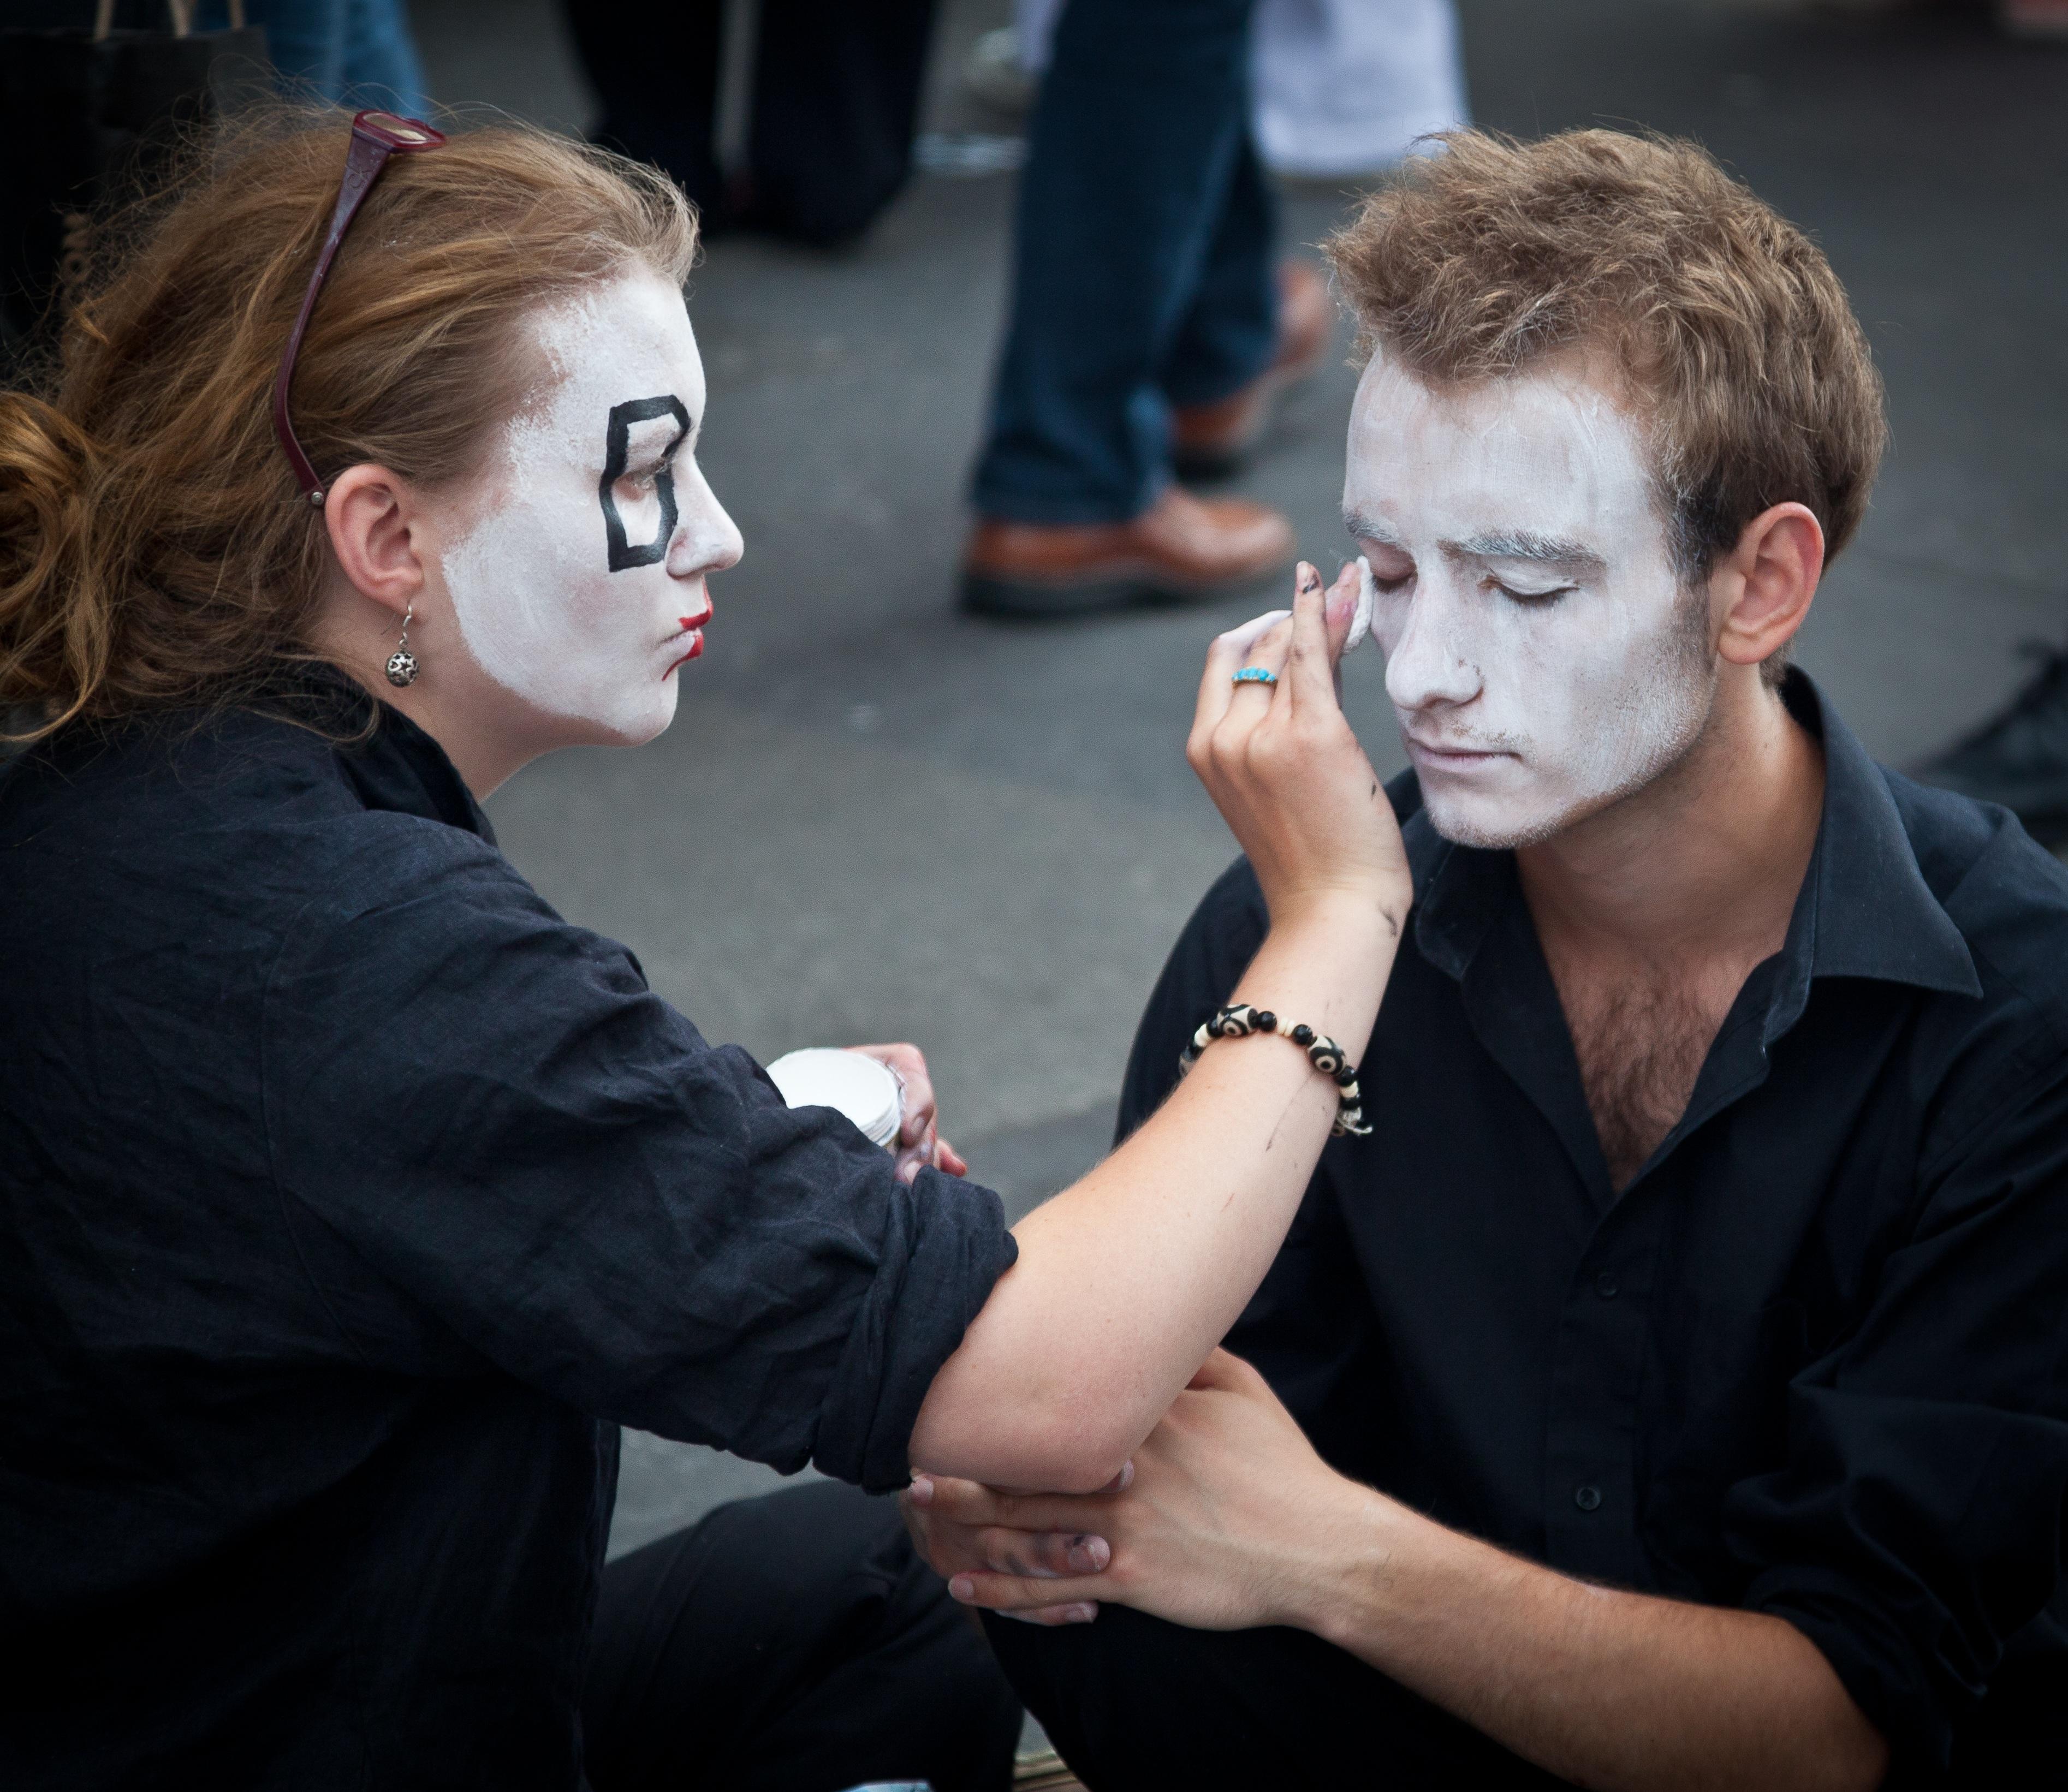 Fotos gratis : gente, artista, Pareja, humano, Moda, maquillaje ...